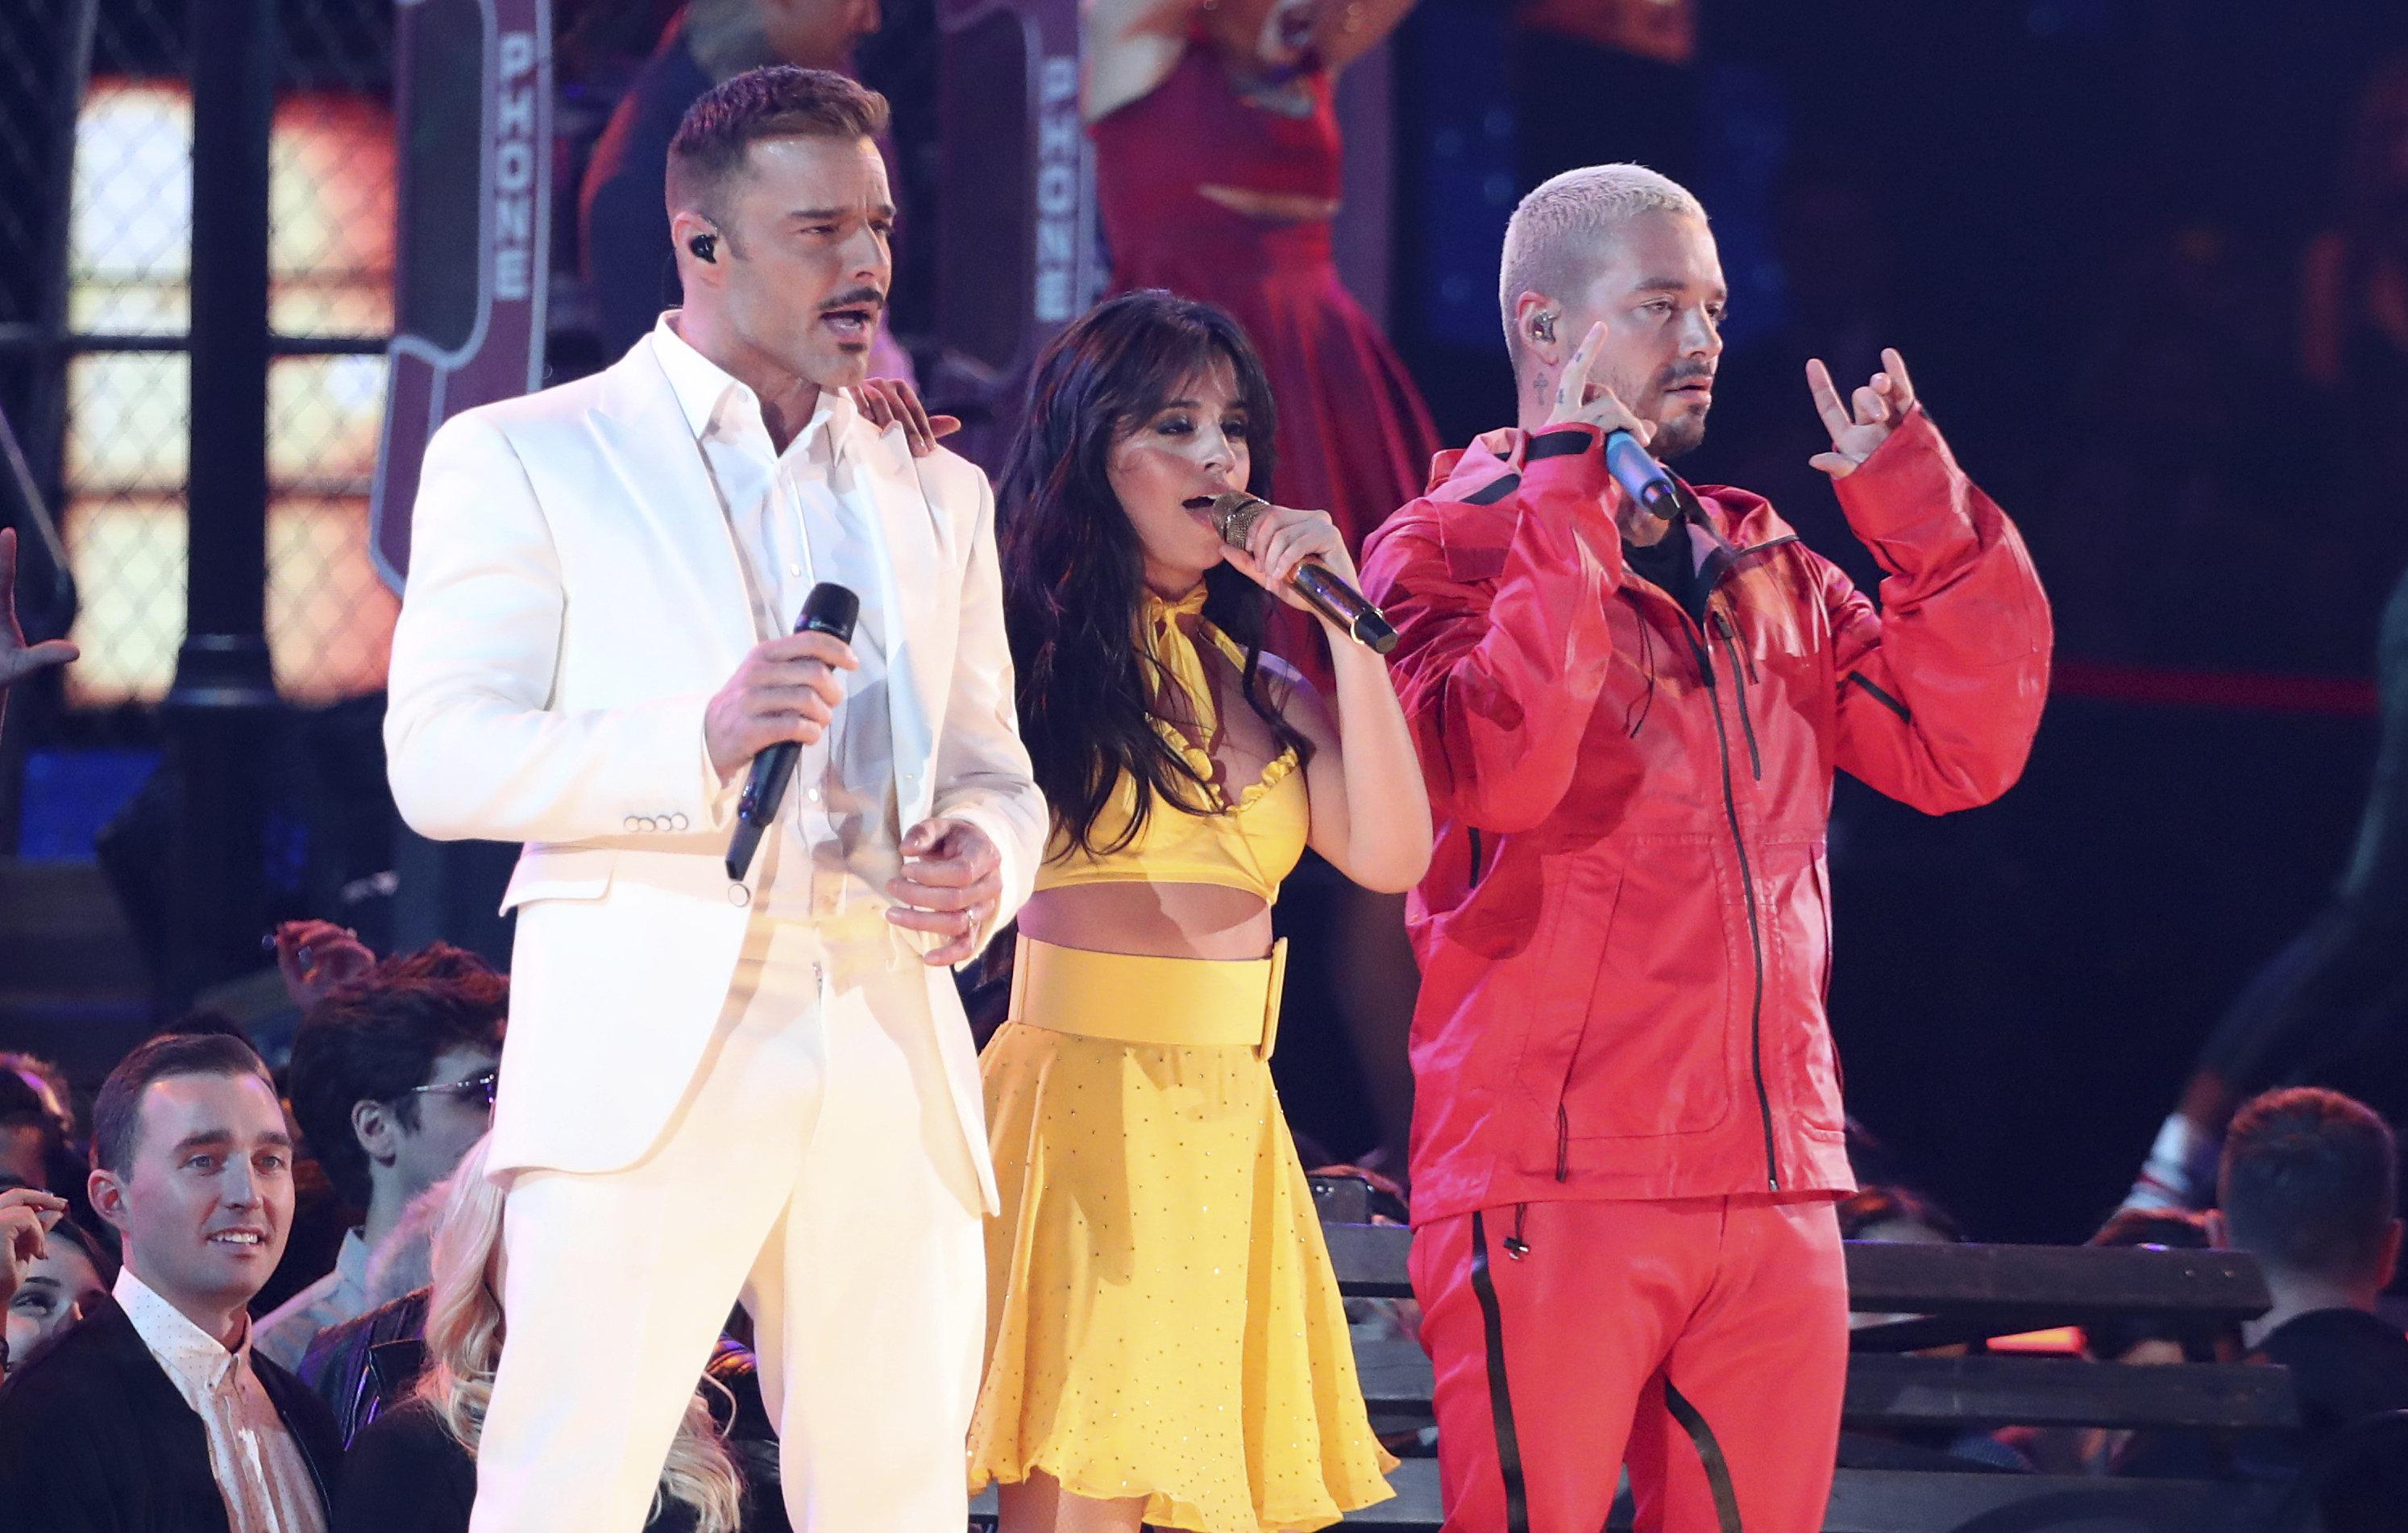 Camila Cabello, Ricky Martin And J Balvin Open 2019 Grammys With Retro-Styled Latin